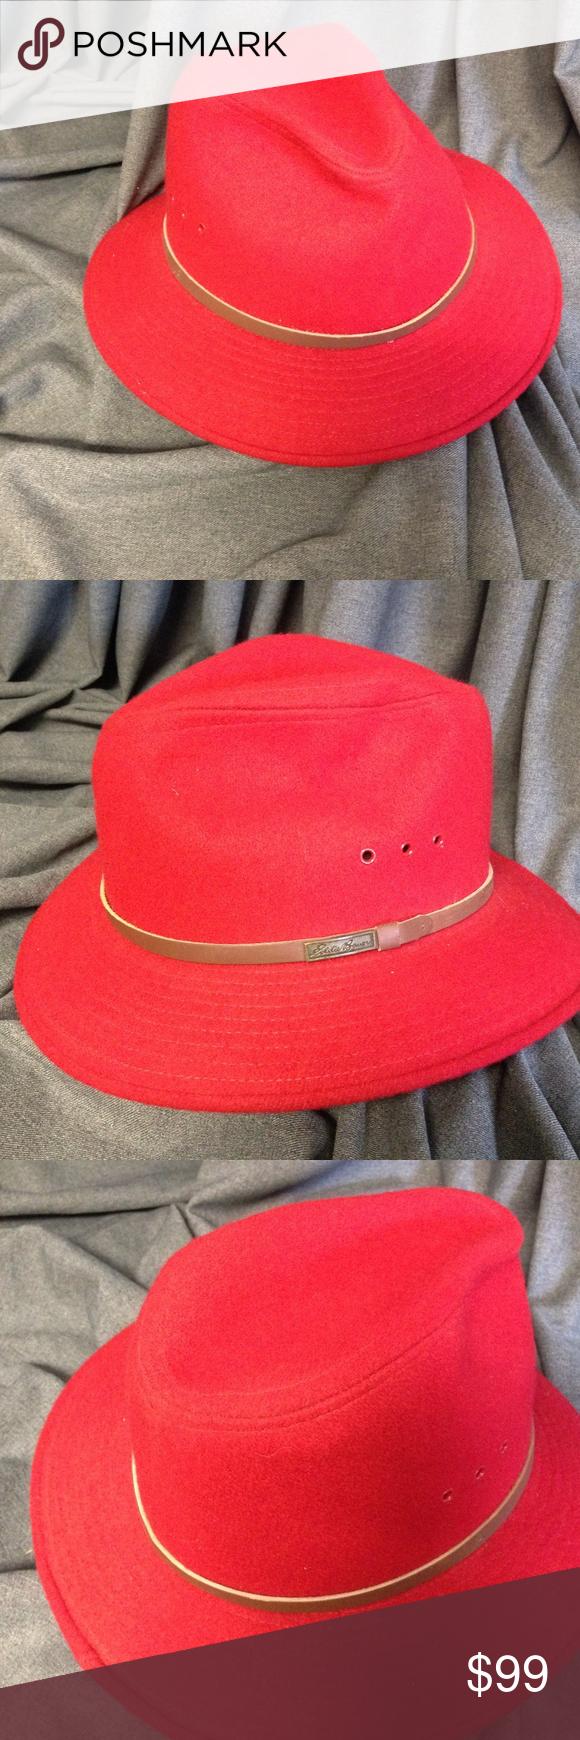 ba389967468bf Eddie Bauer Xlarge Red Outback long brim Woolblend Eddie Bauer Xlarge Red  Outback long brim Woolblend Floppy Brim Hat  Safari -nice h…